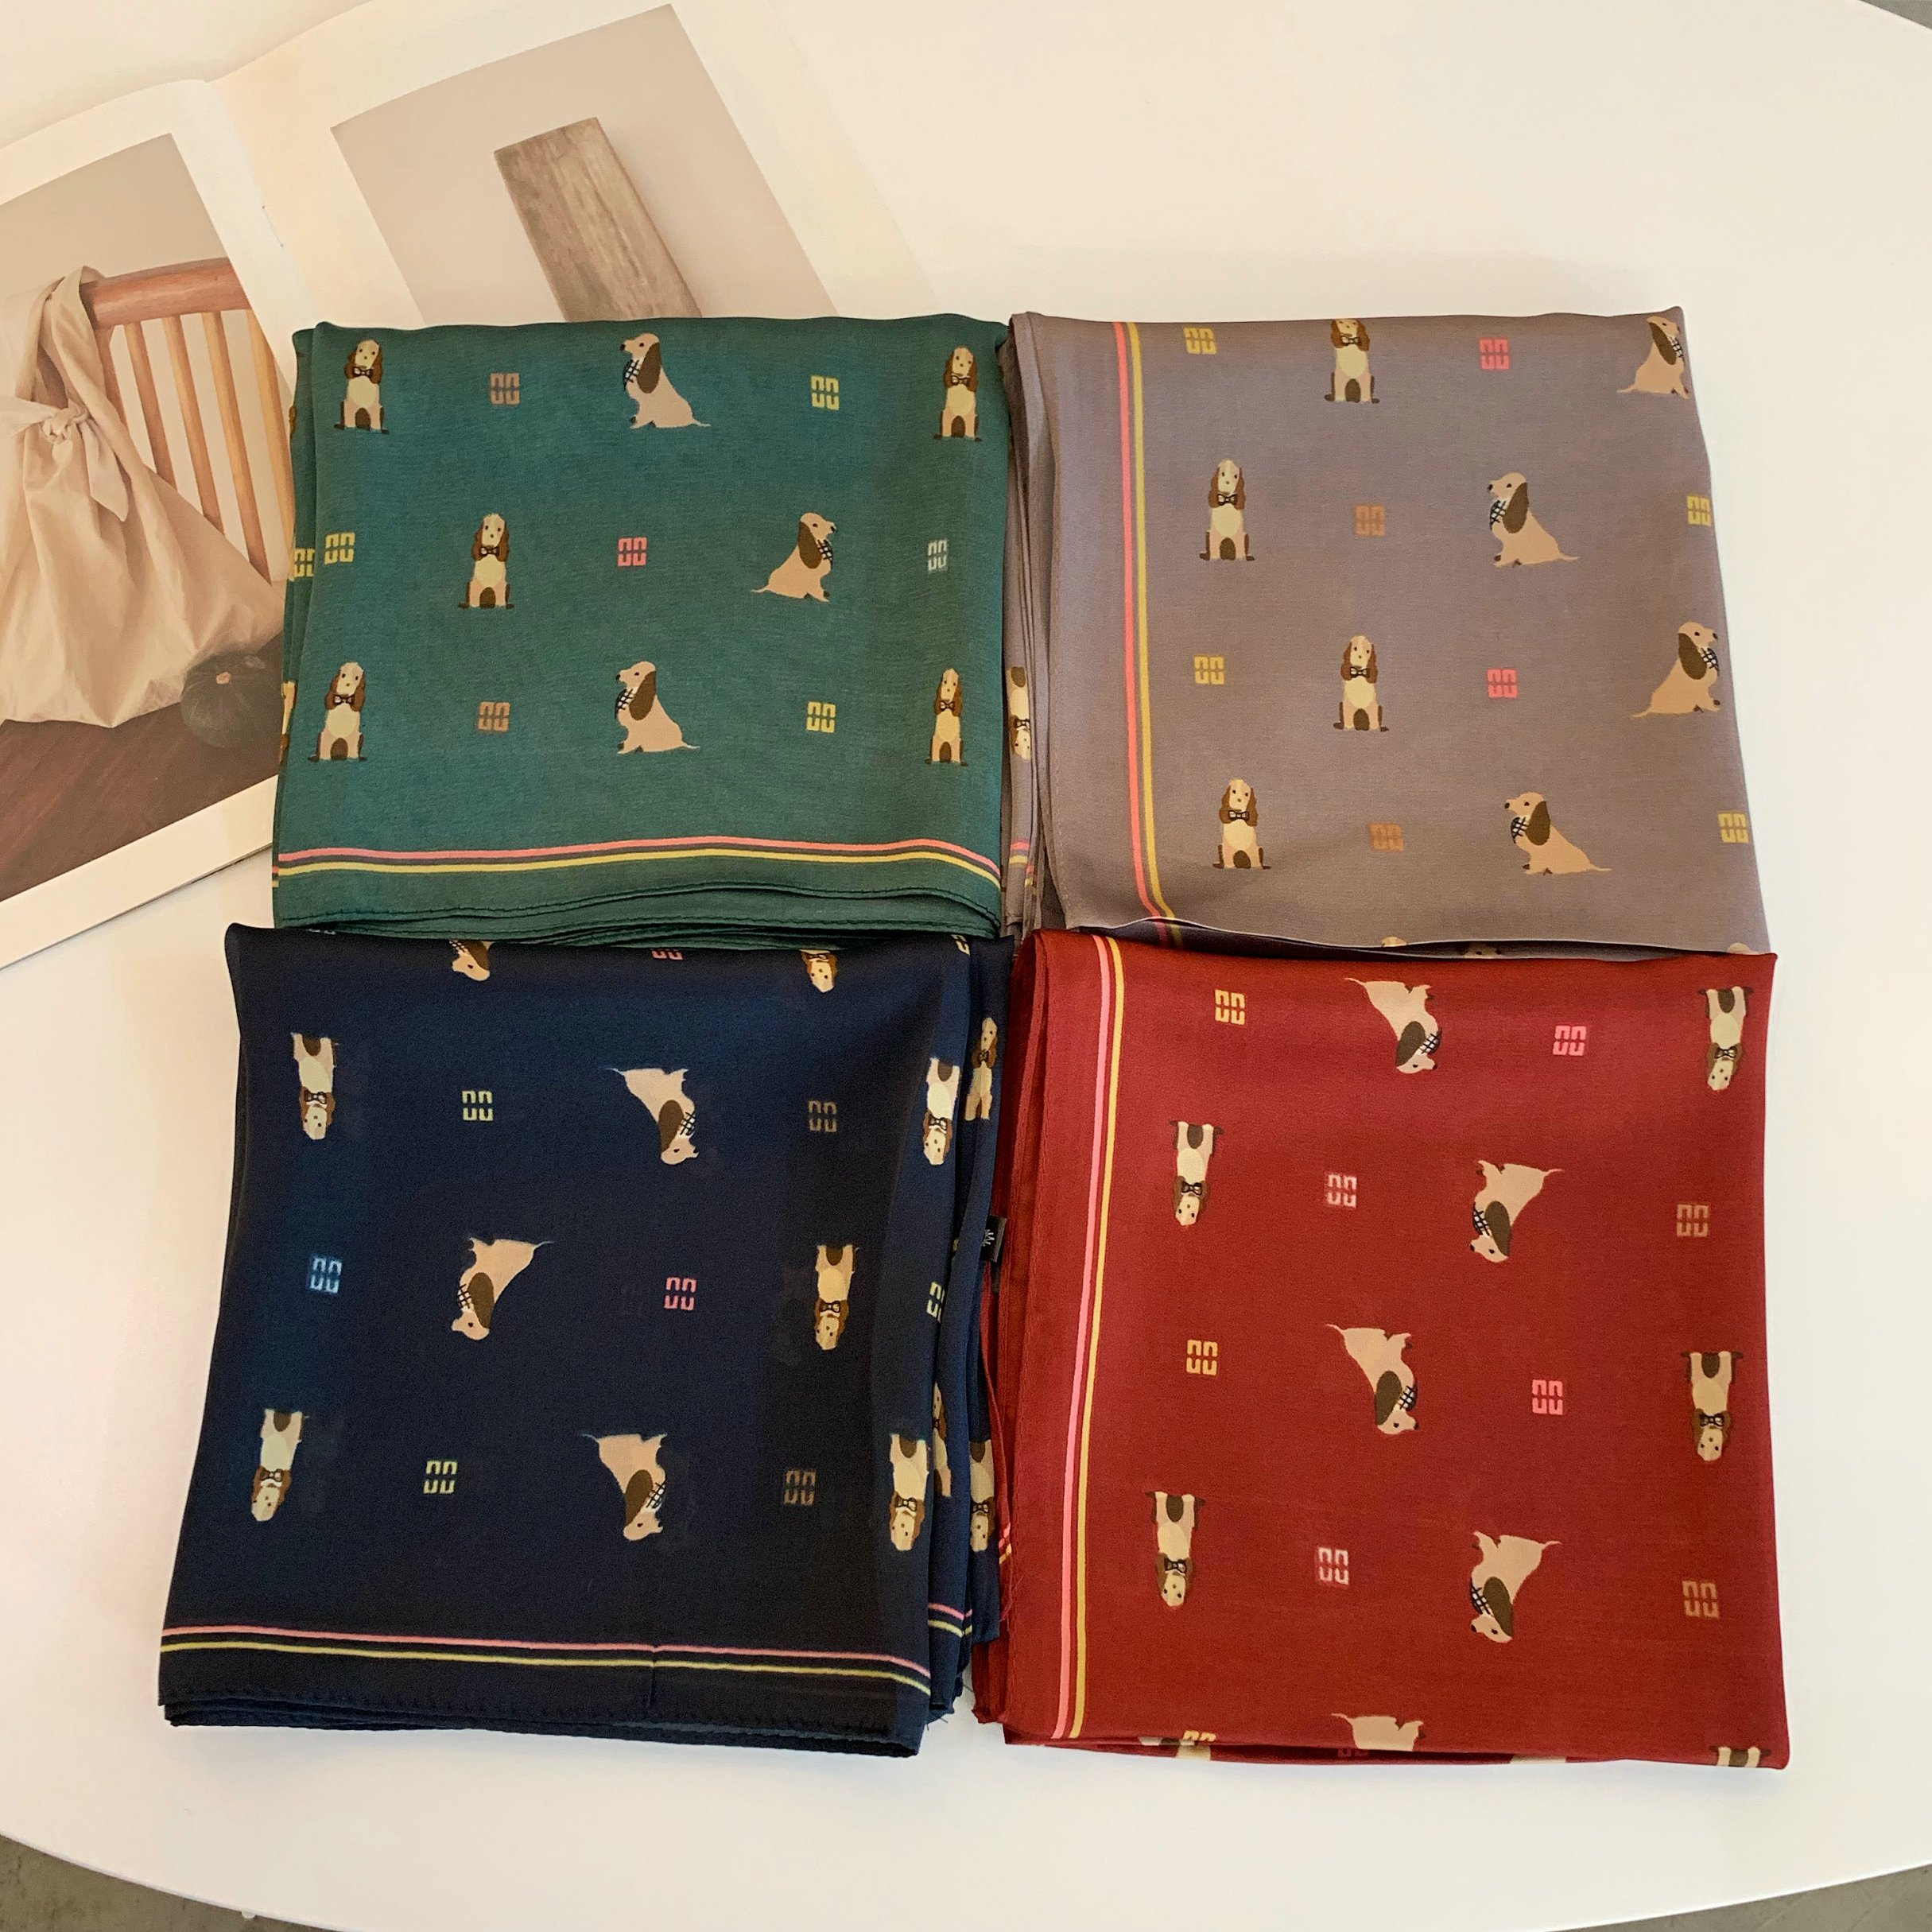 70*70 Printing Dog Small Square Scarf Small Silk Like Scarf Women's Thin Scarf Fashion Scarf